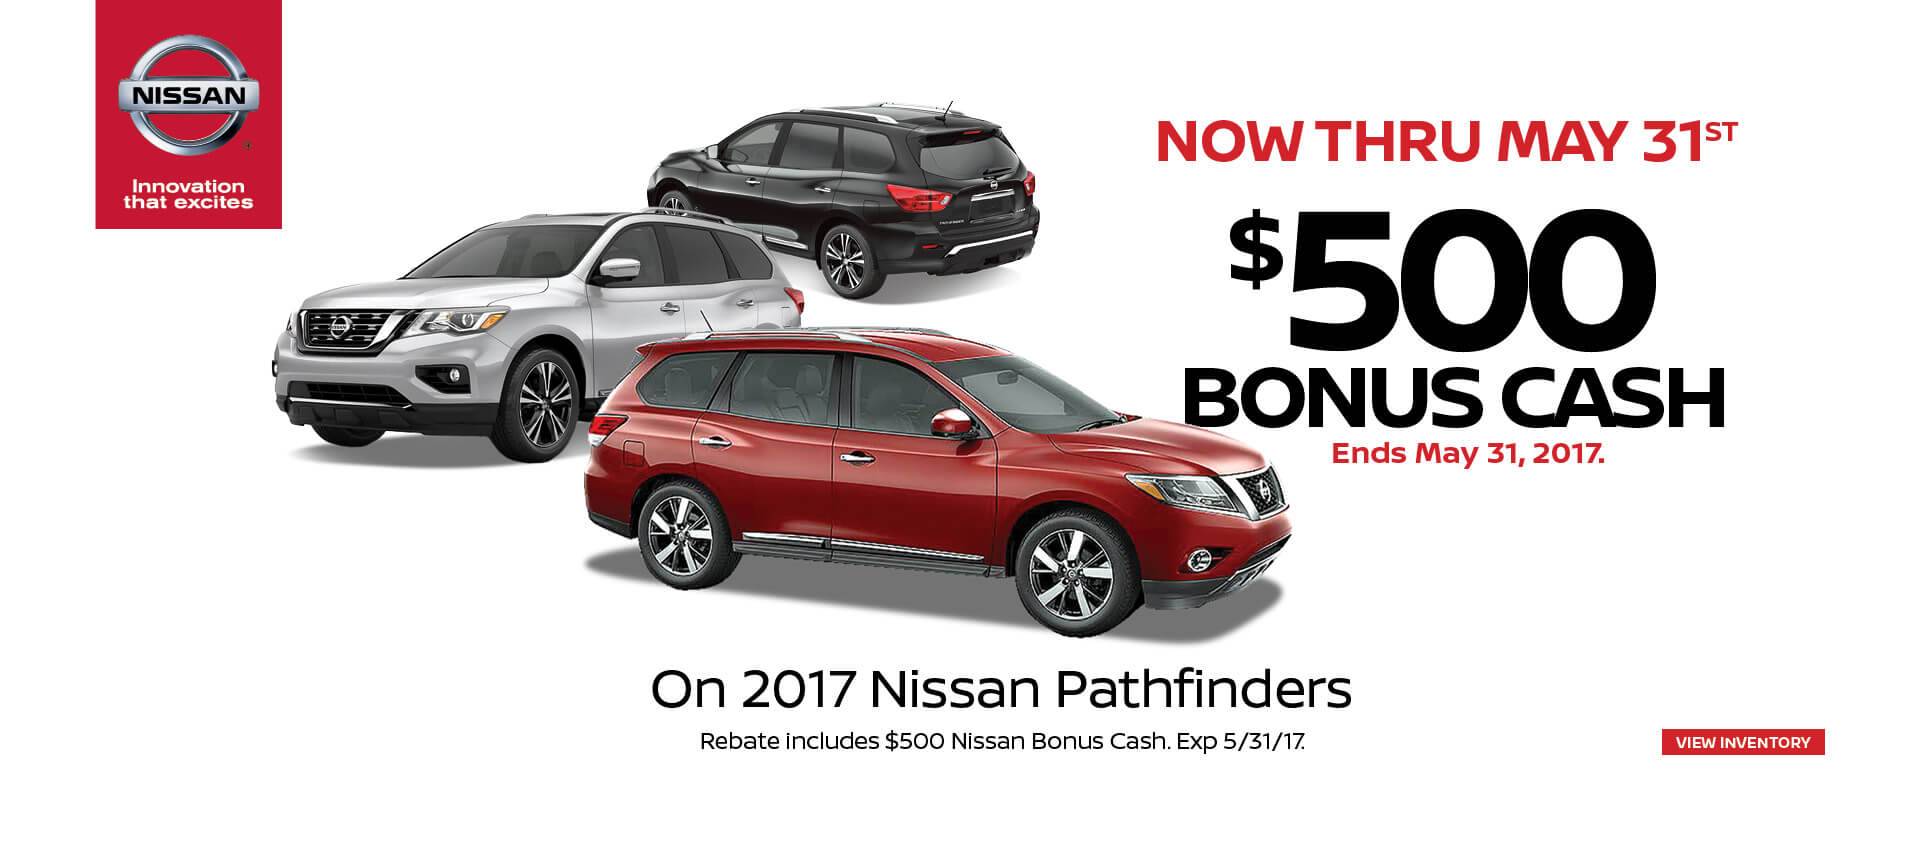 Pathfinder $500 Bonus Cash